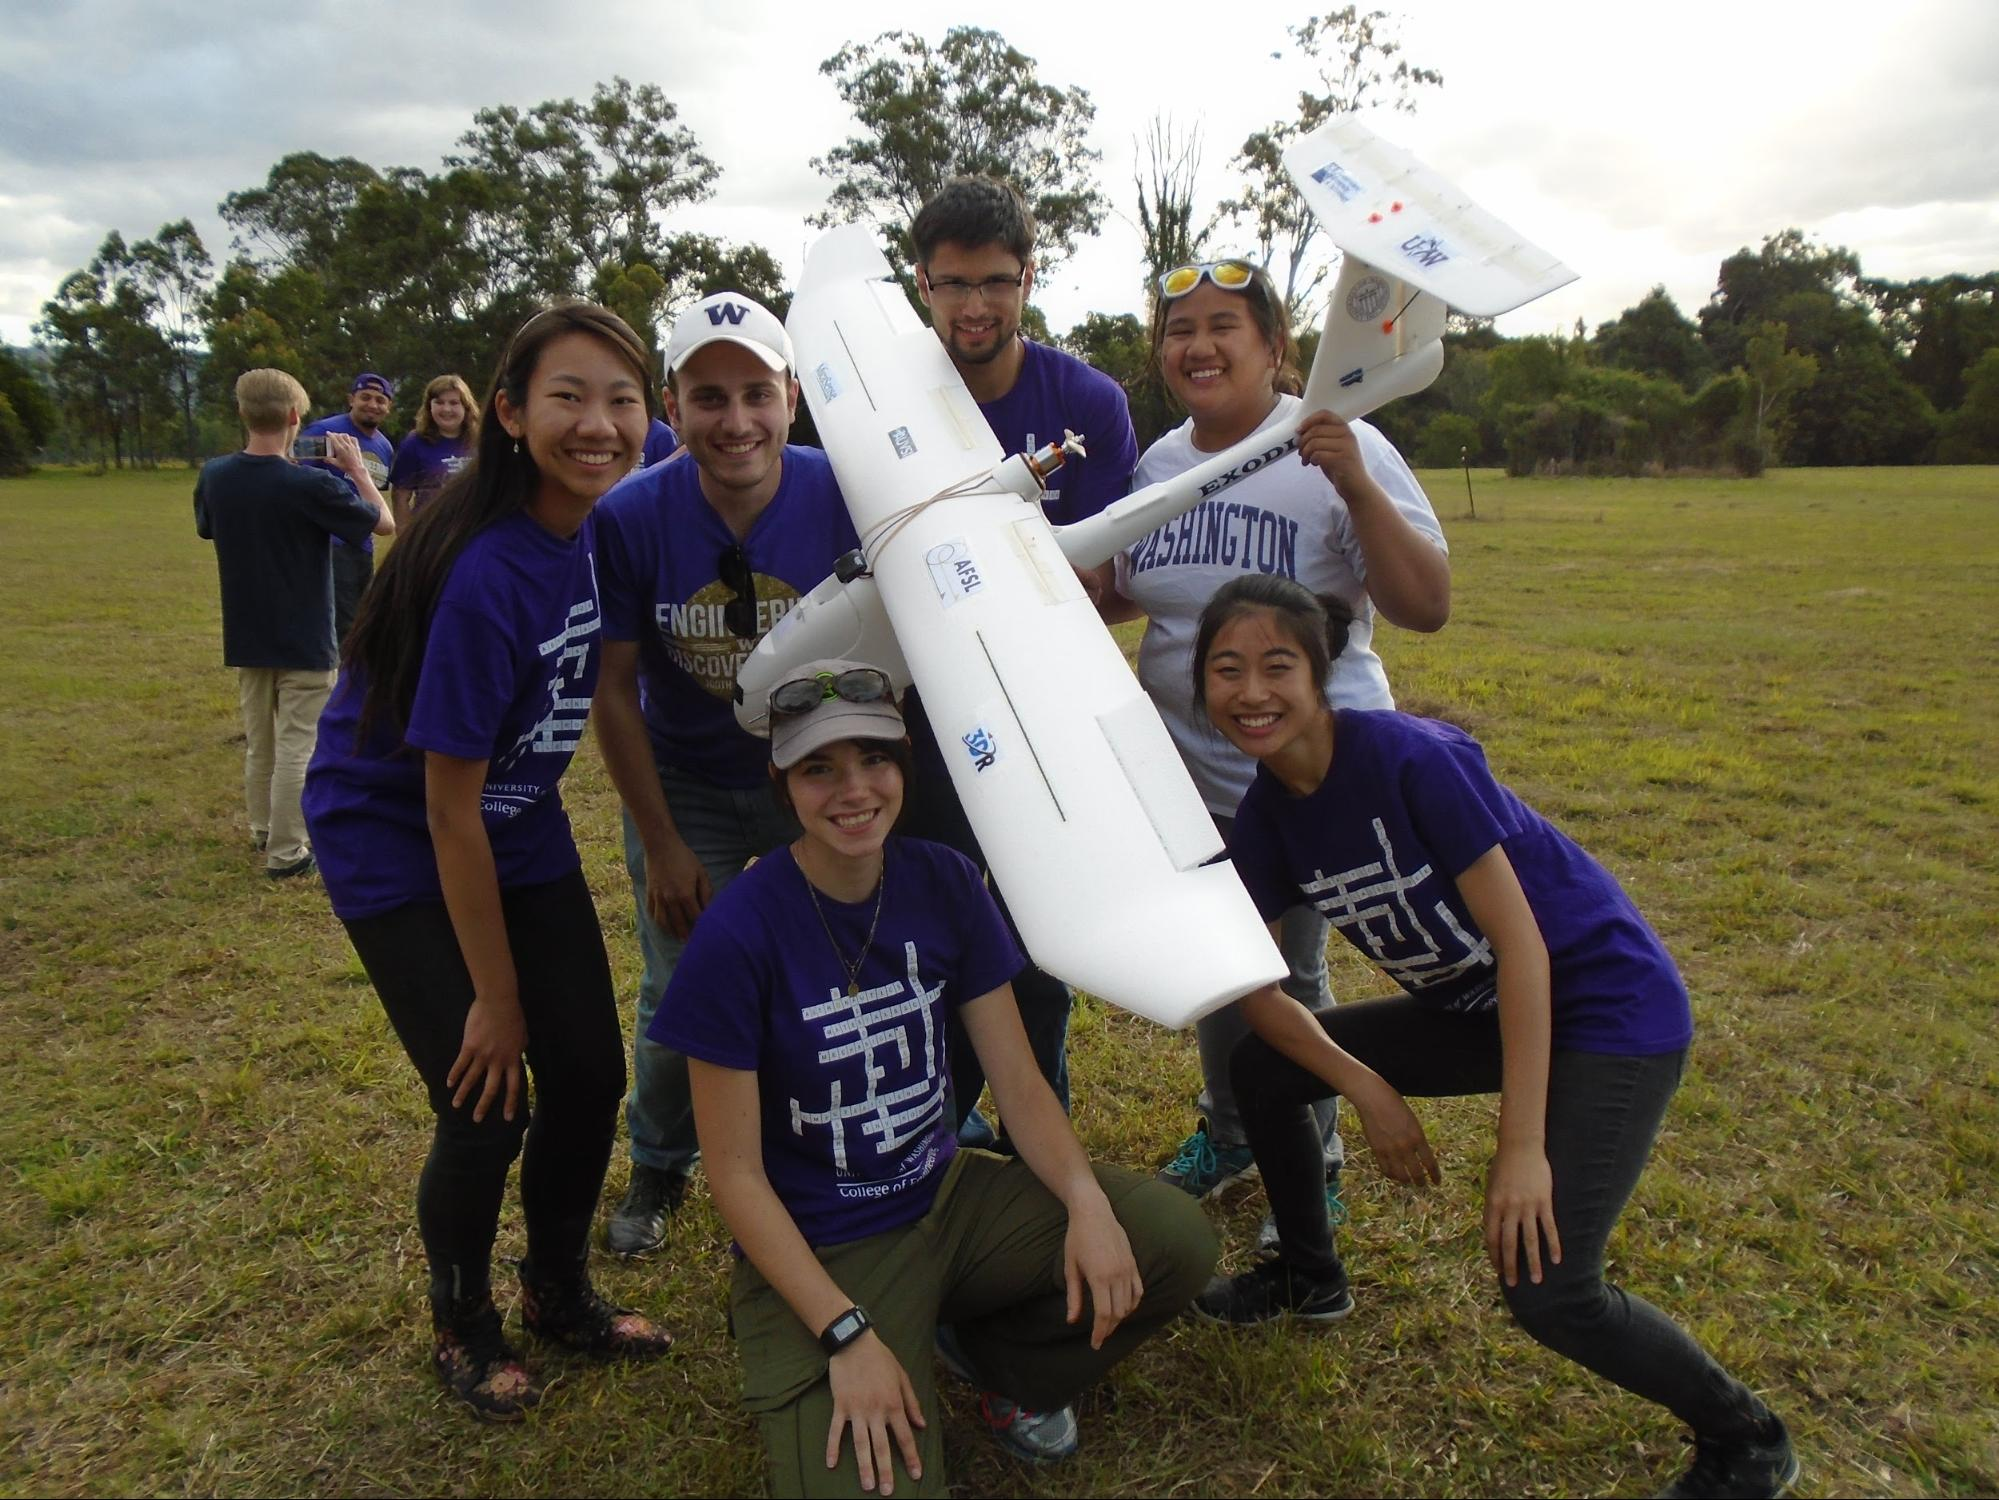 The Exodia team post mission. Photo credit: Jonathan Solomon. (From left to right) Back: Jennifer Look, Maximilian Vertucci, Daniel Corona, Gizelle Gando; Front: Lara Millman and Jessica Trinh.